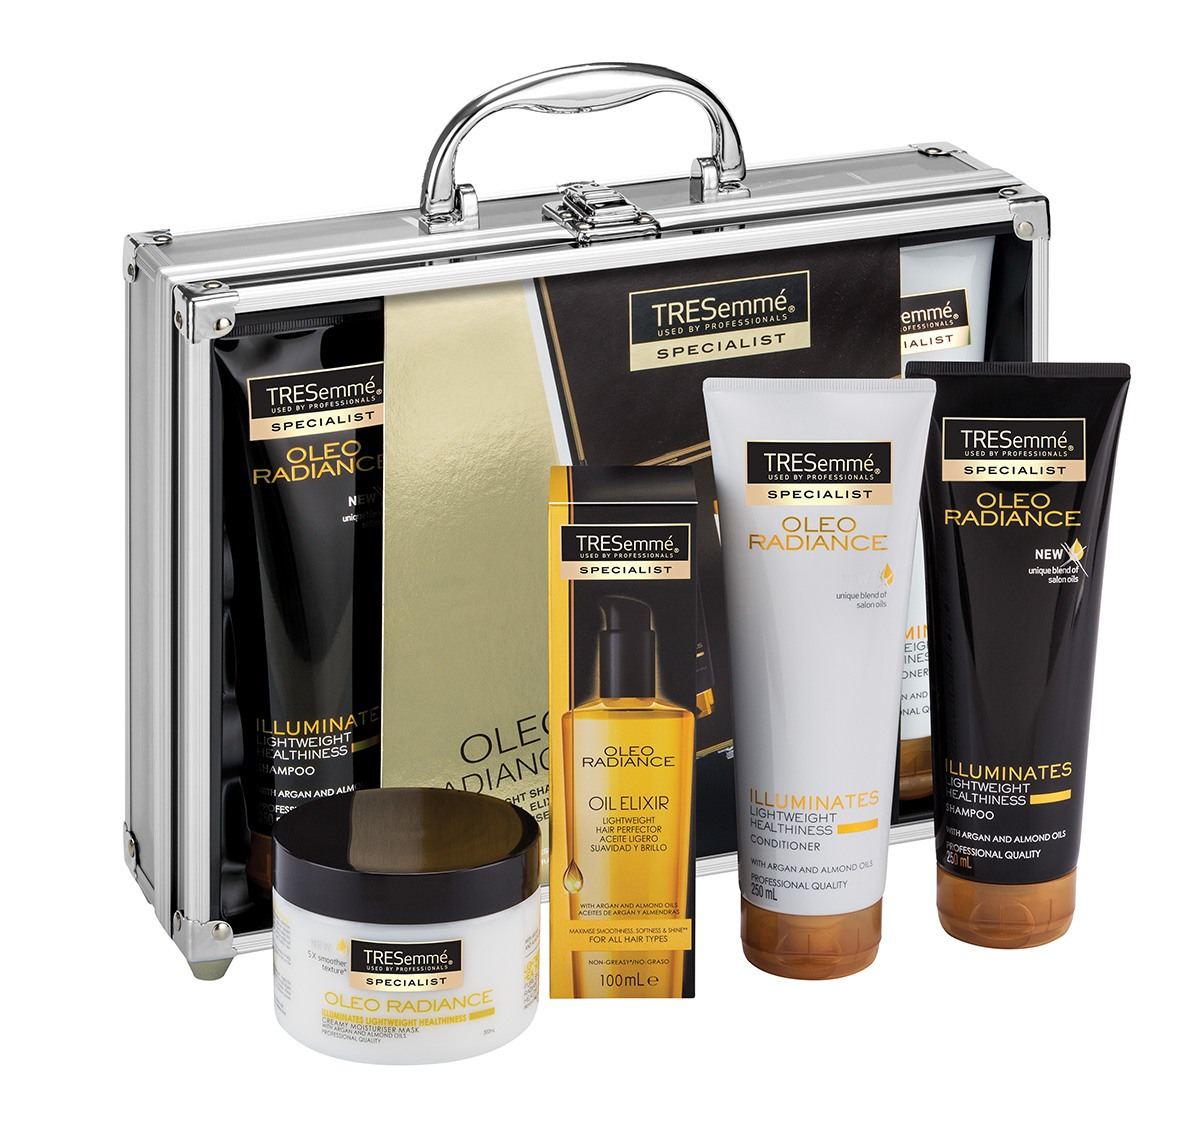 hair gifts Christmas: All Things Hair - IMAGE - TRESemmé Oleo Radiance